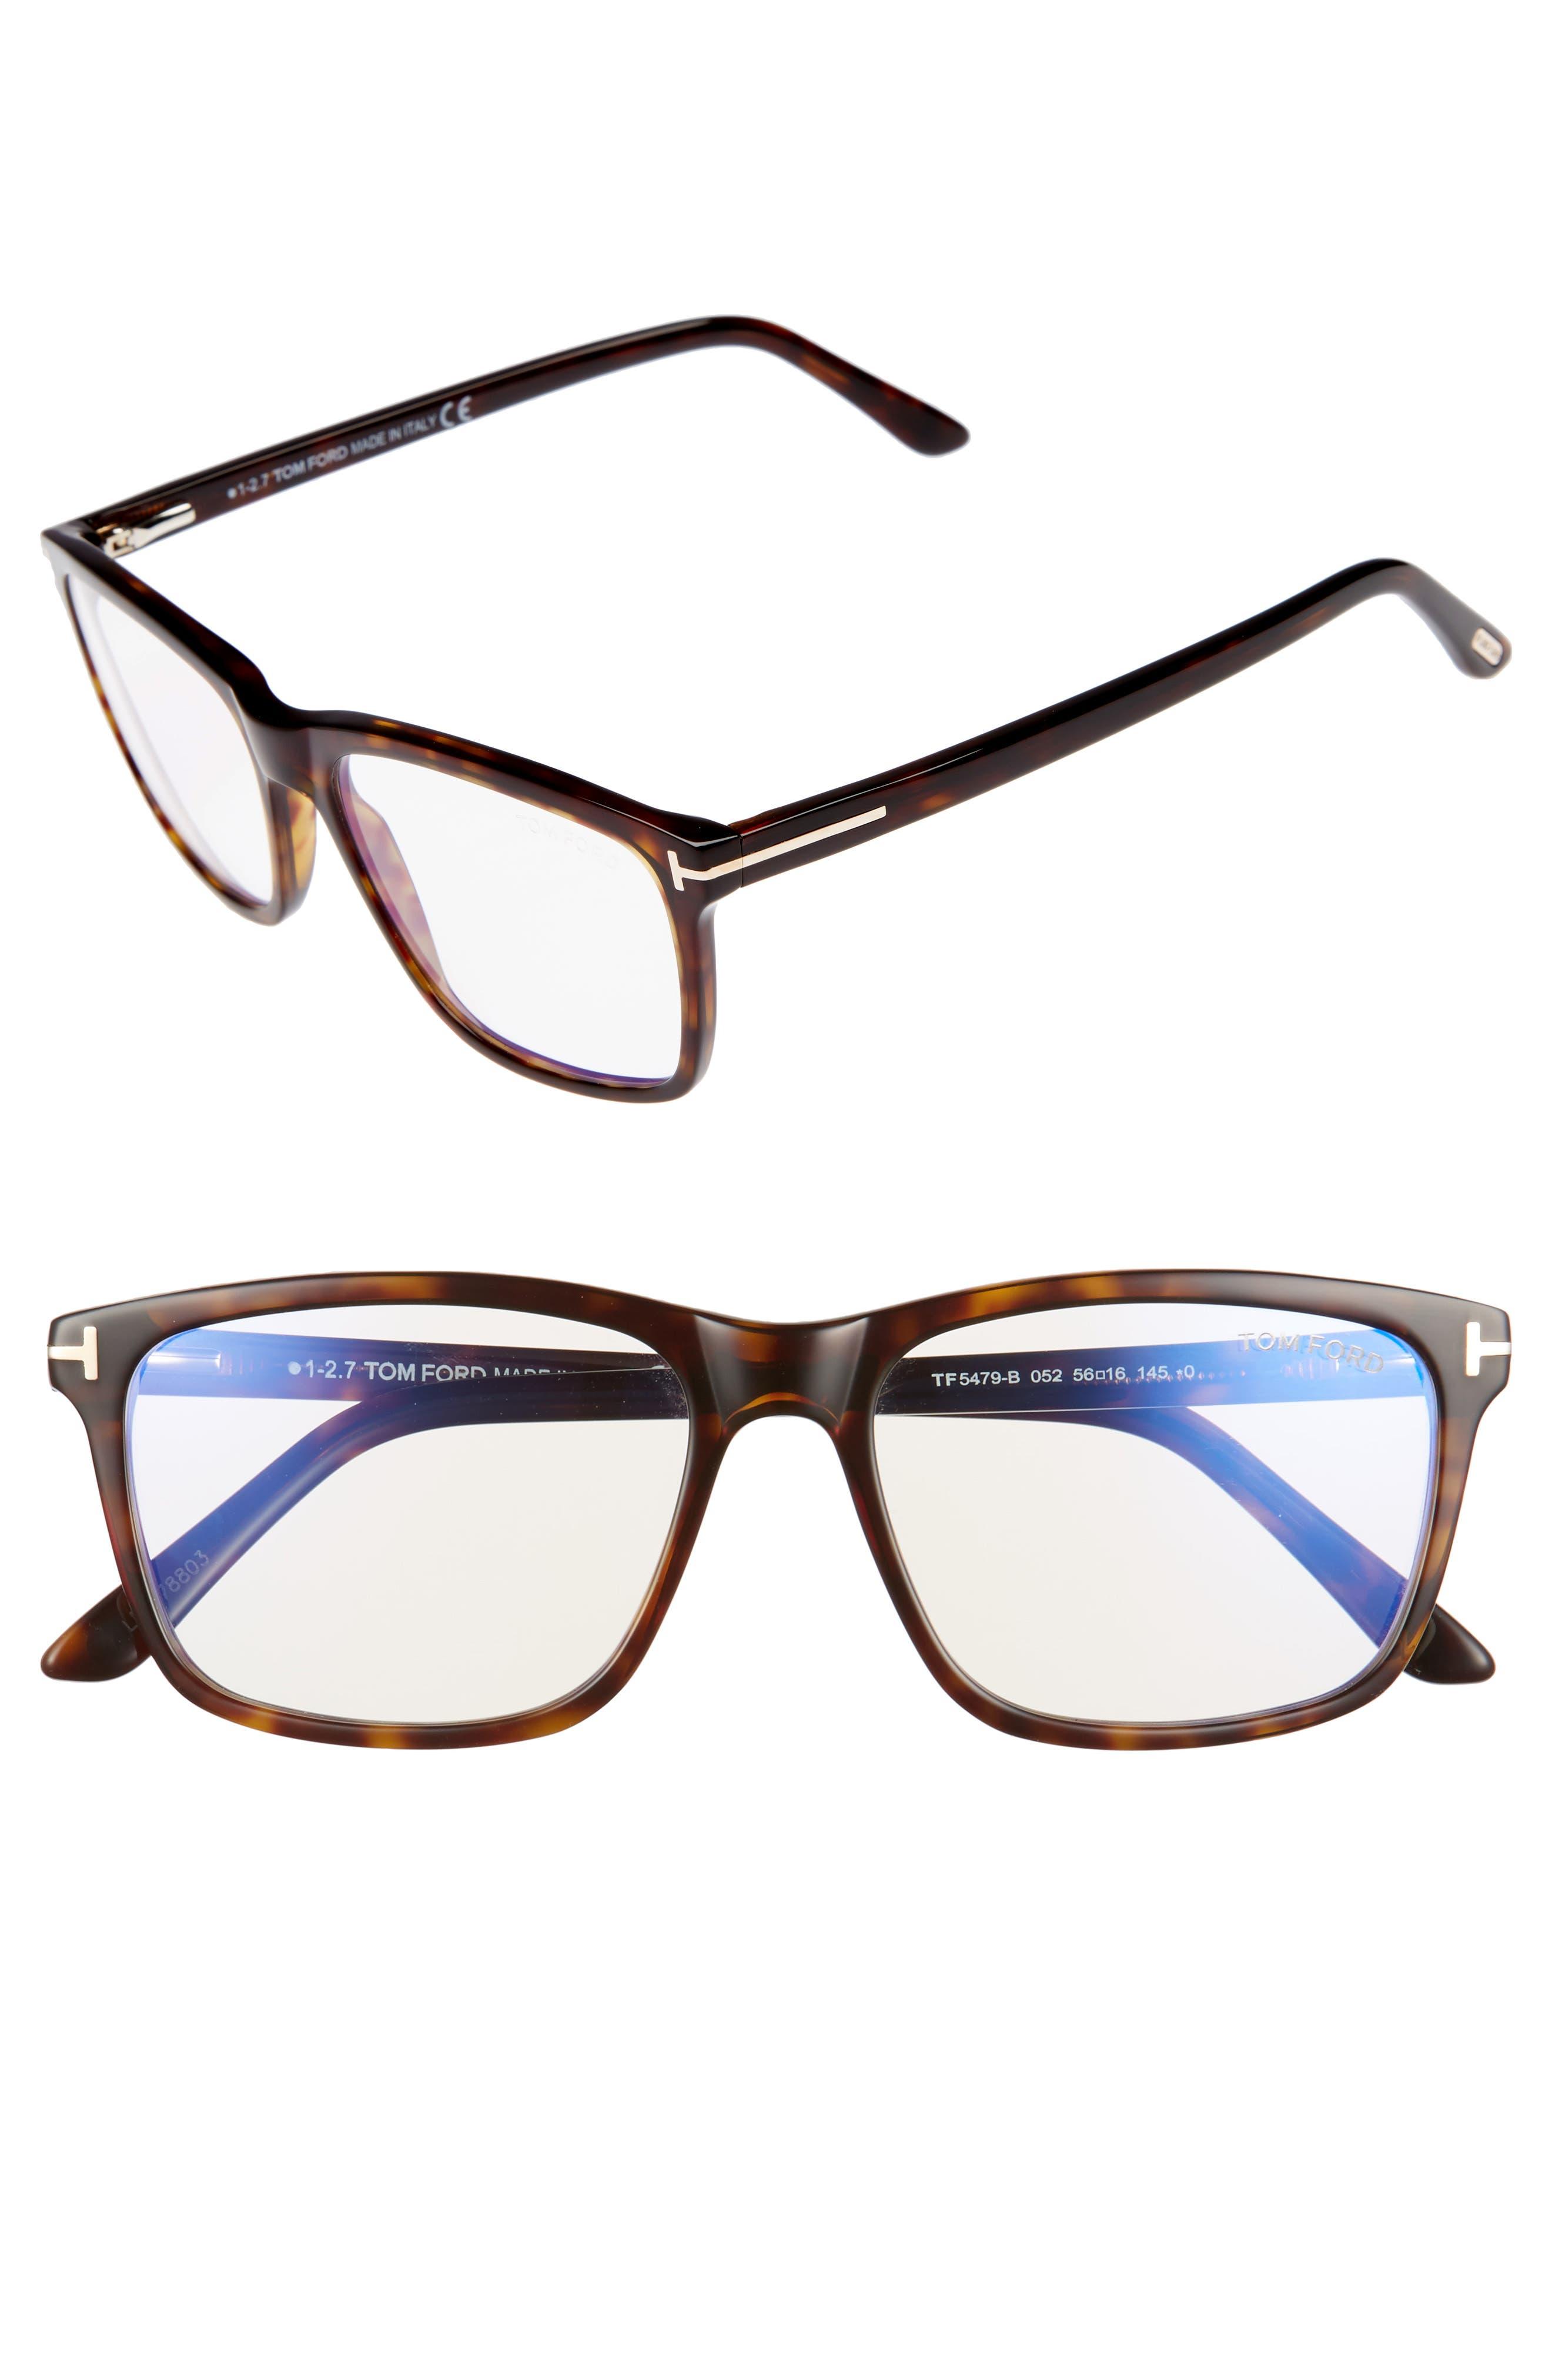 Tom Ford 56mm Optical Glasses